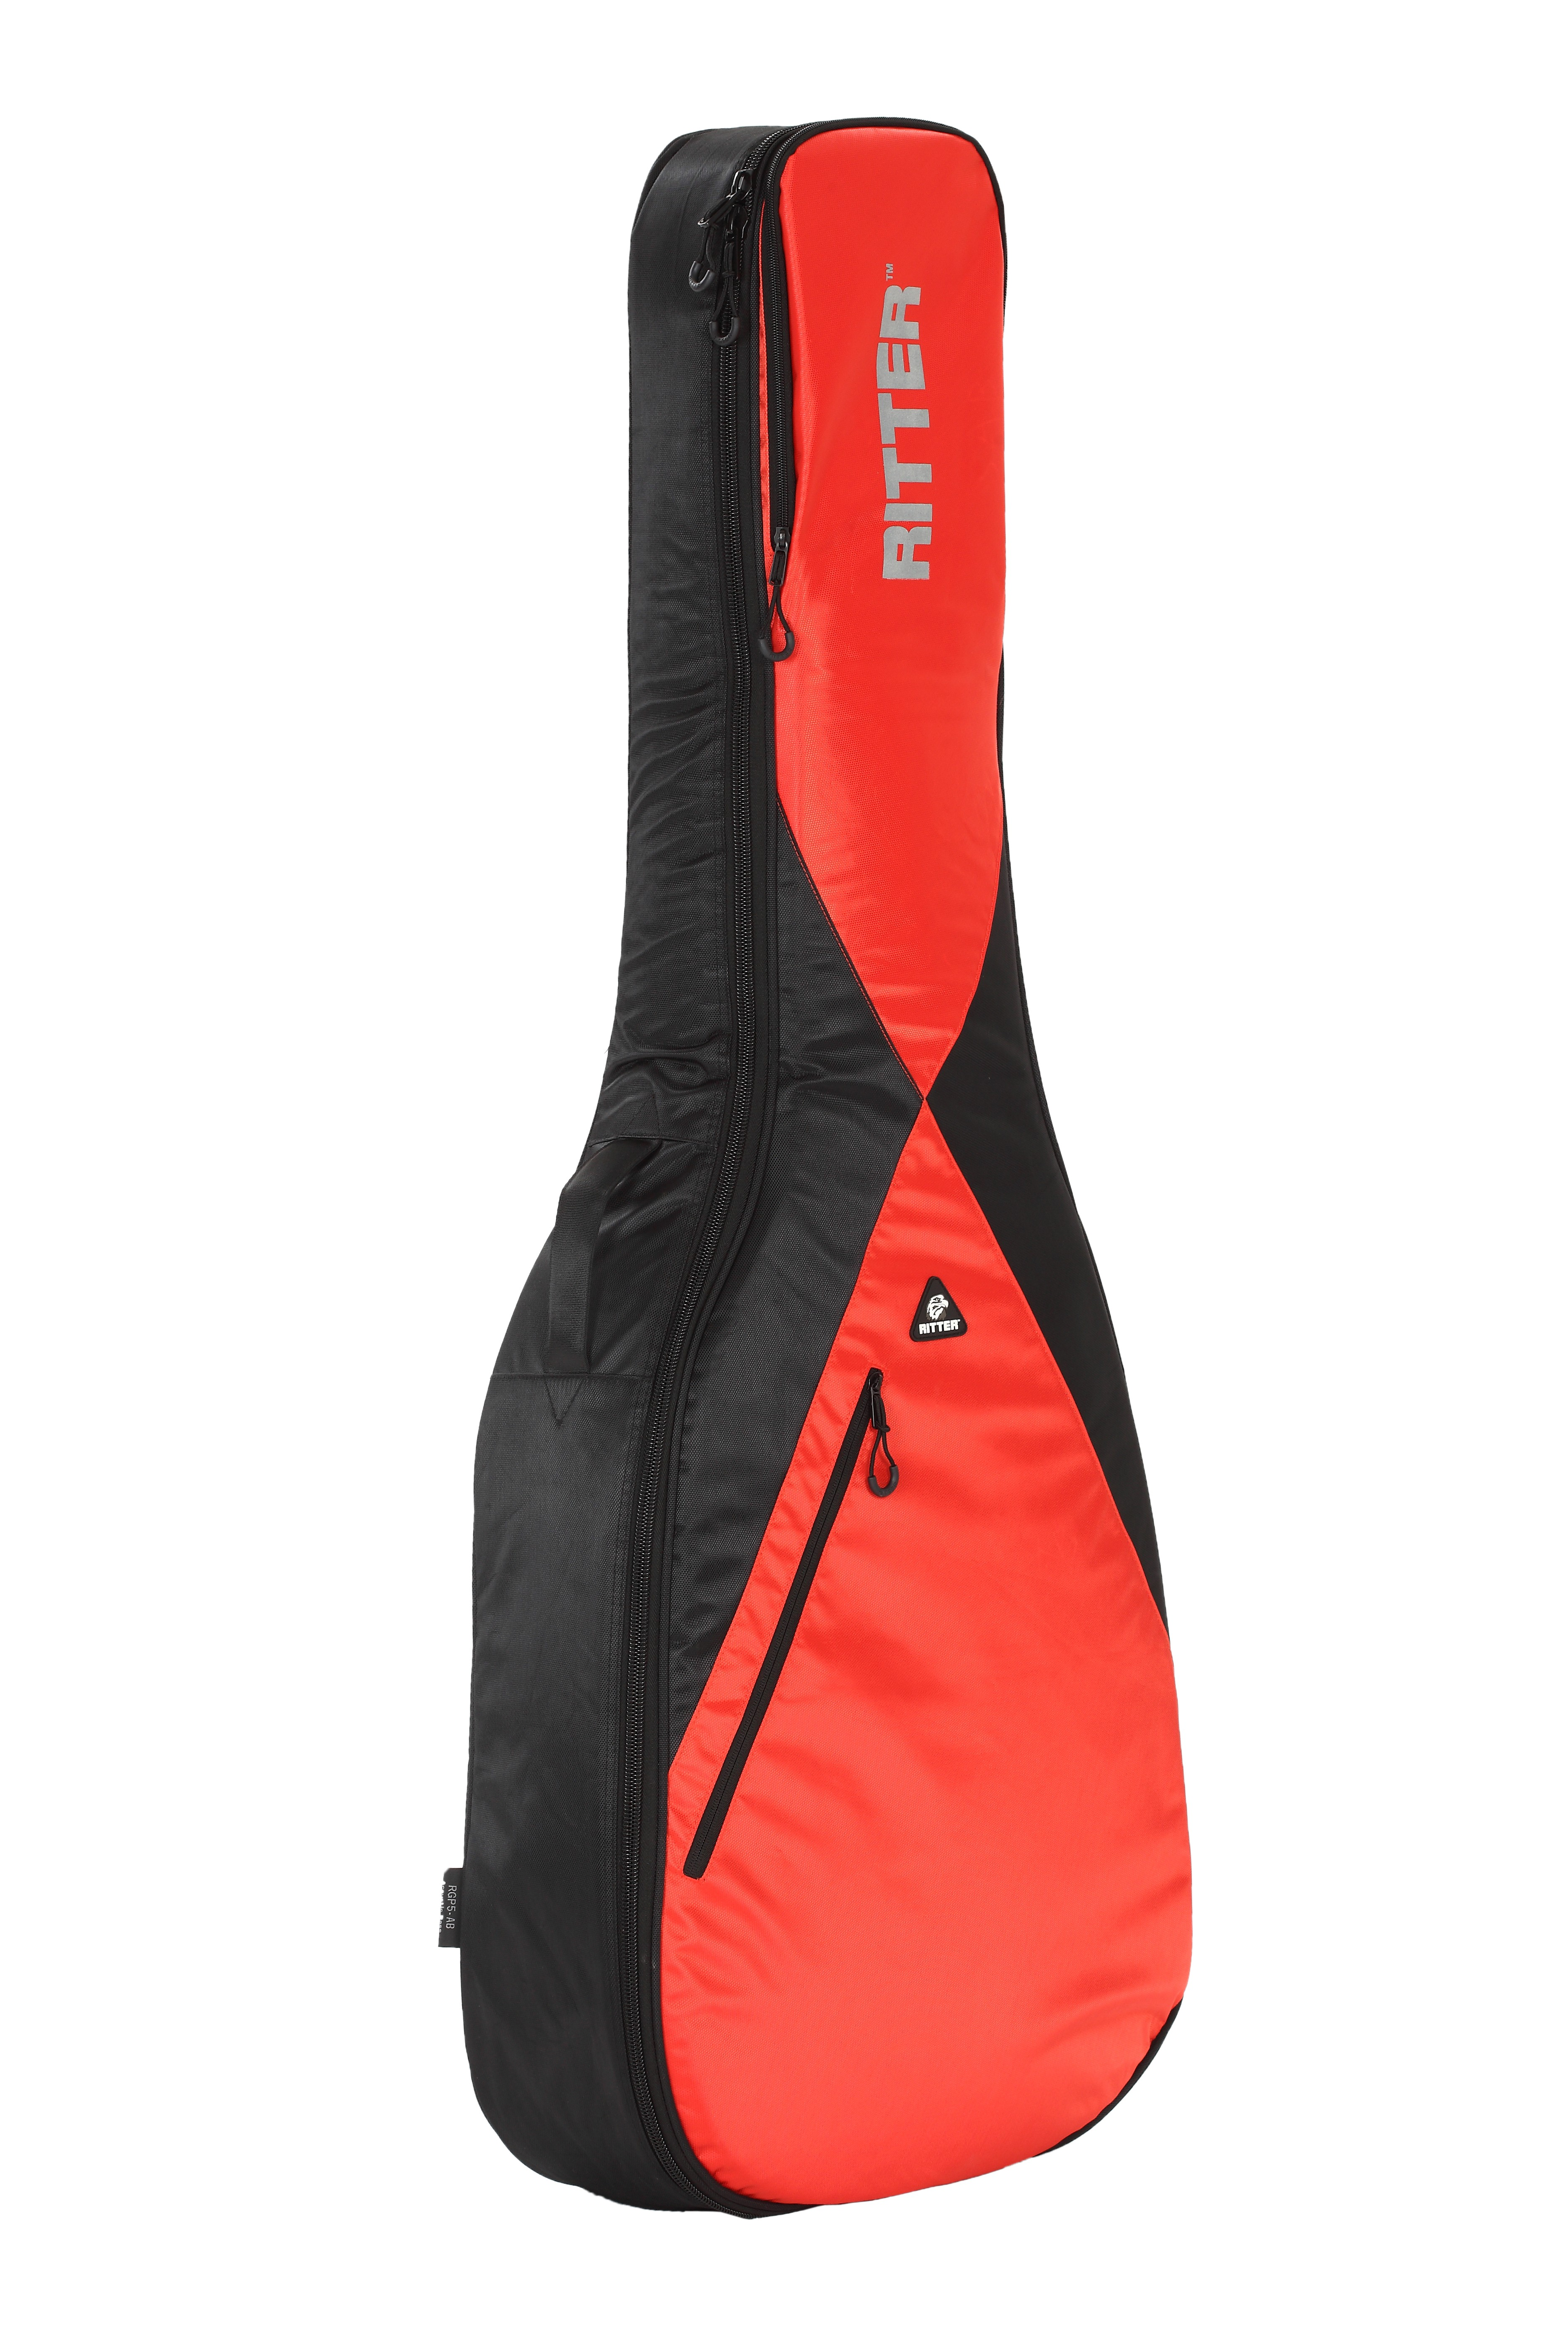 Ritter RGP5-AB/BRR Acoustic Bass Bag - Black/Racing Red